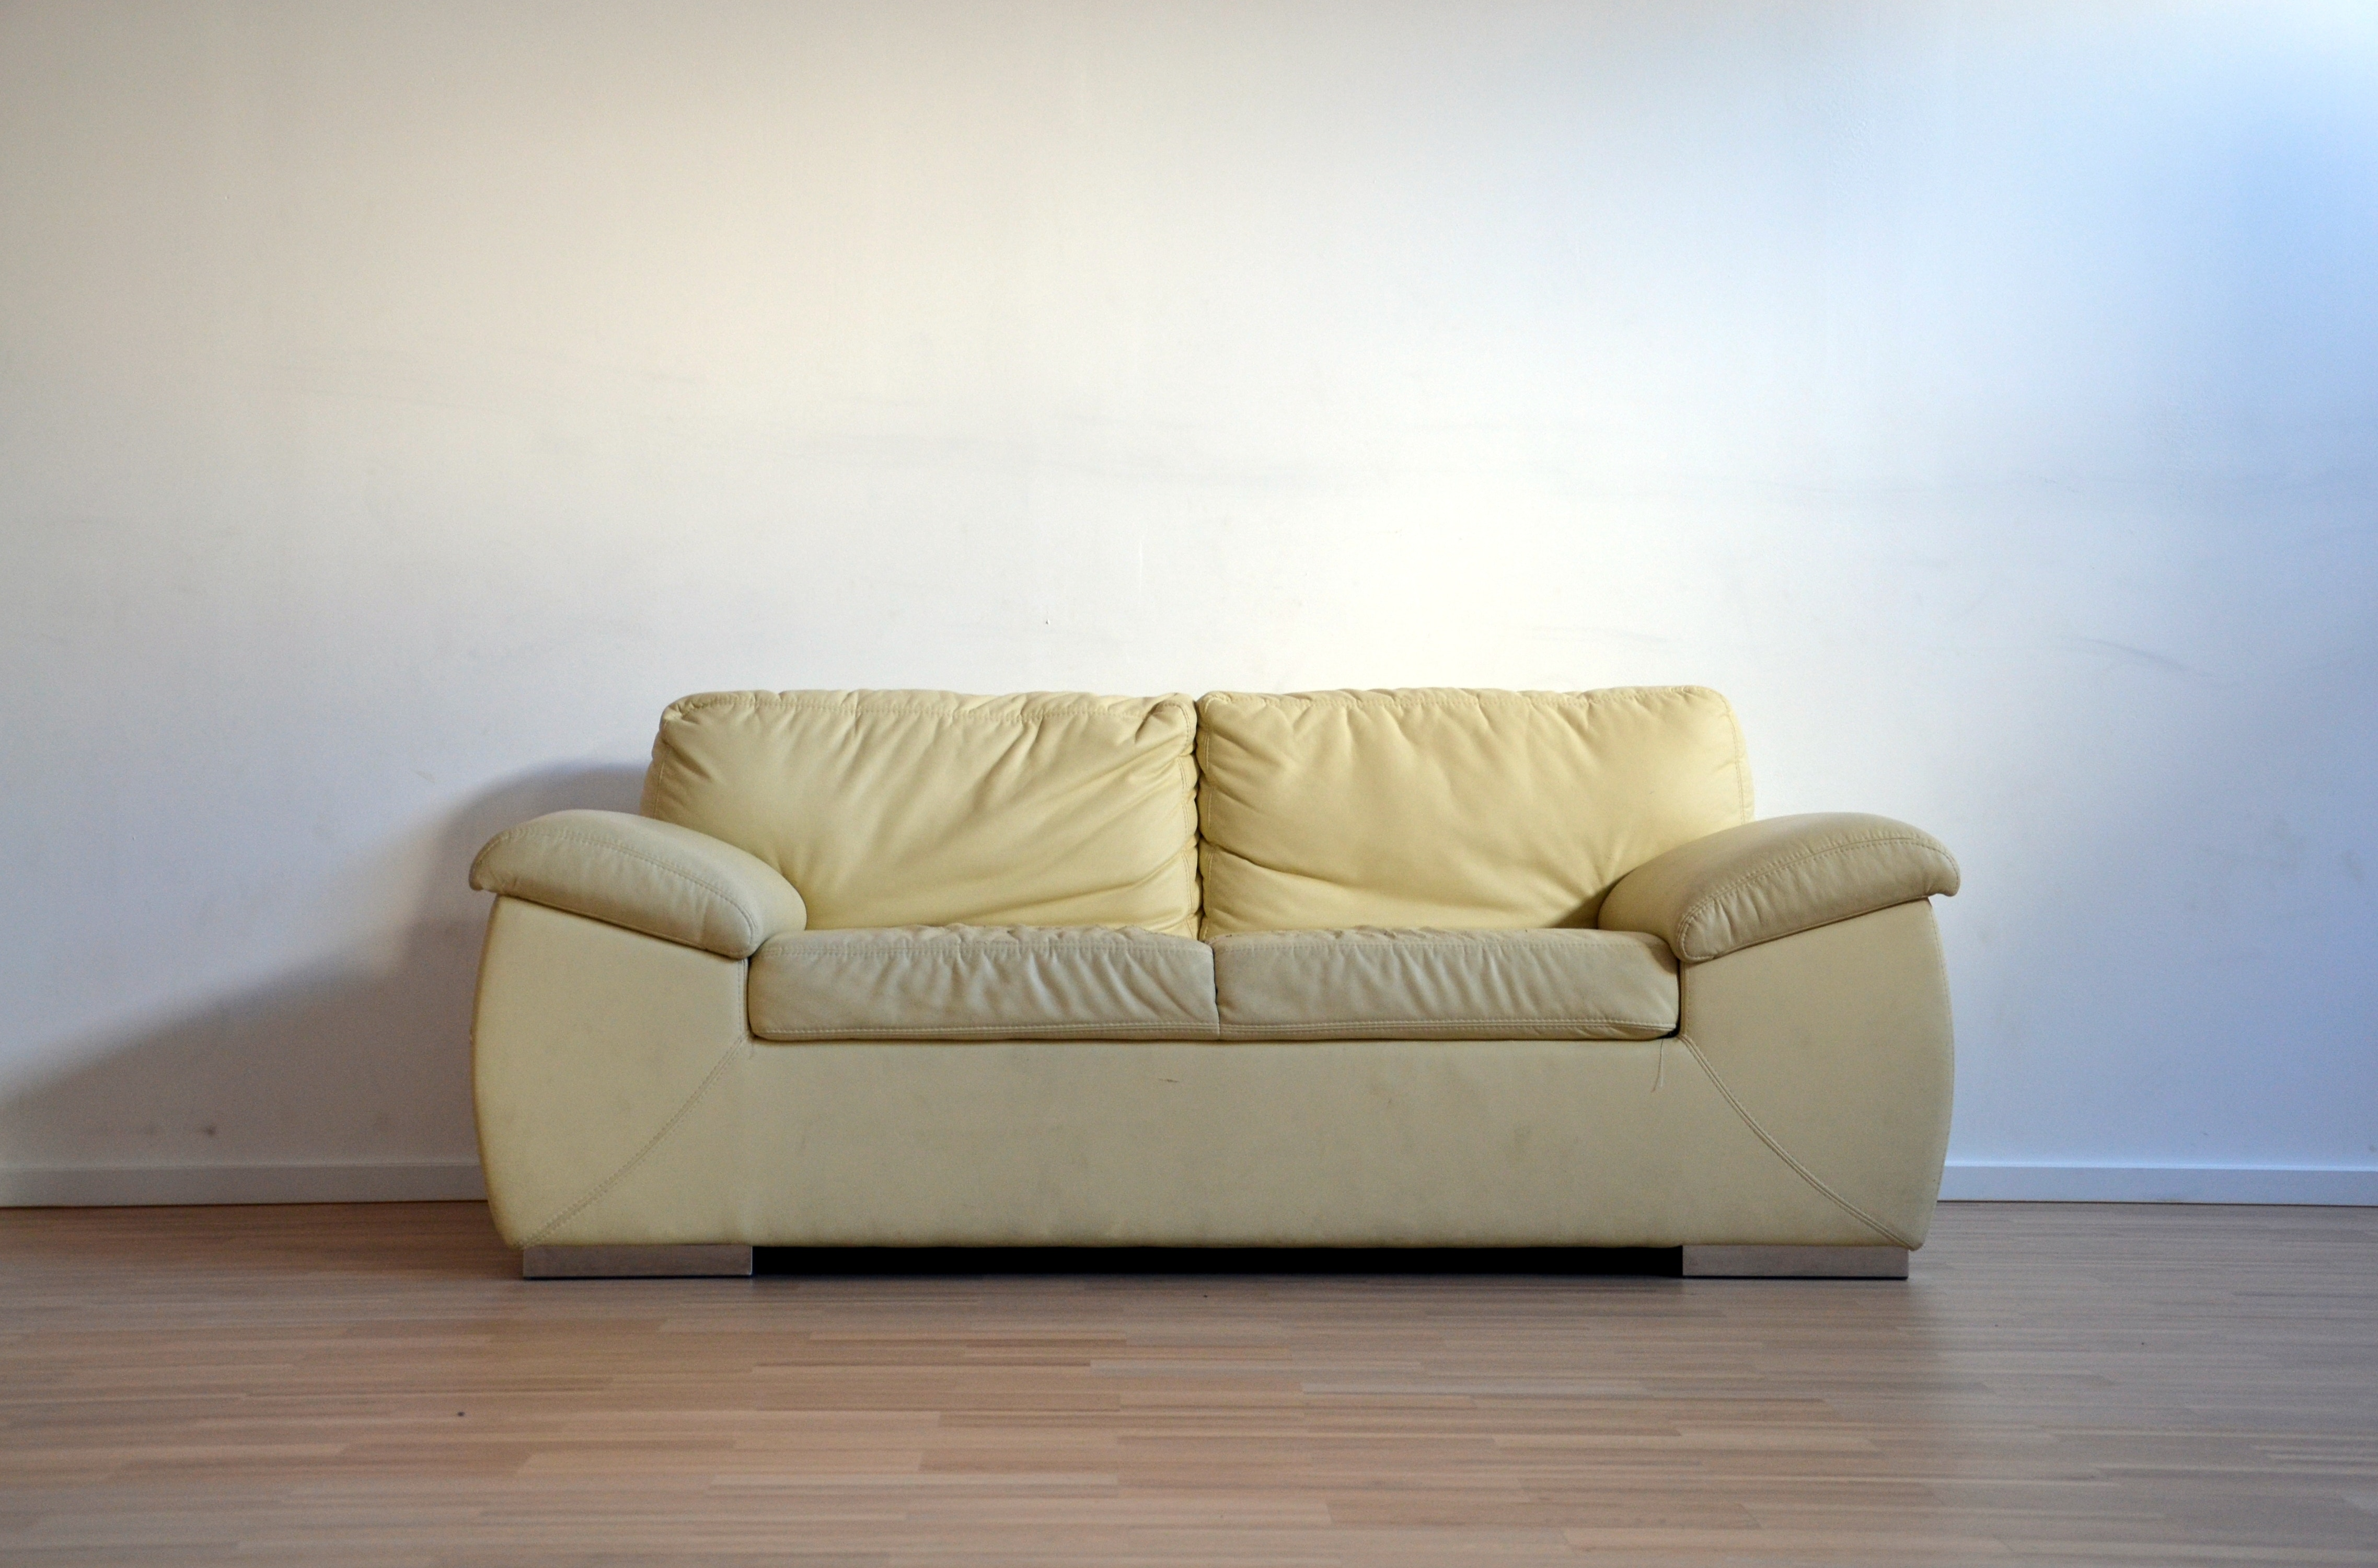 Cream sofa in empty room before upholstery Glasgow